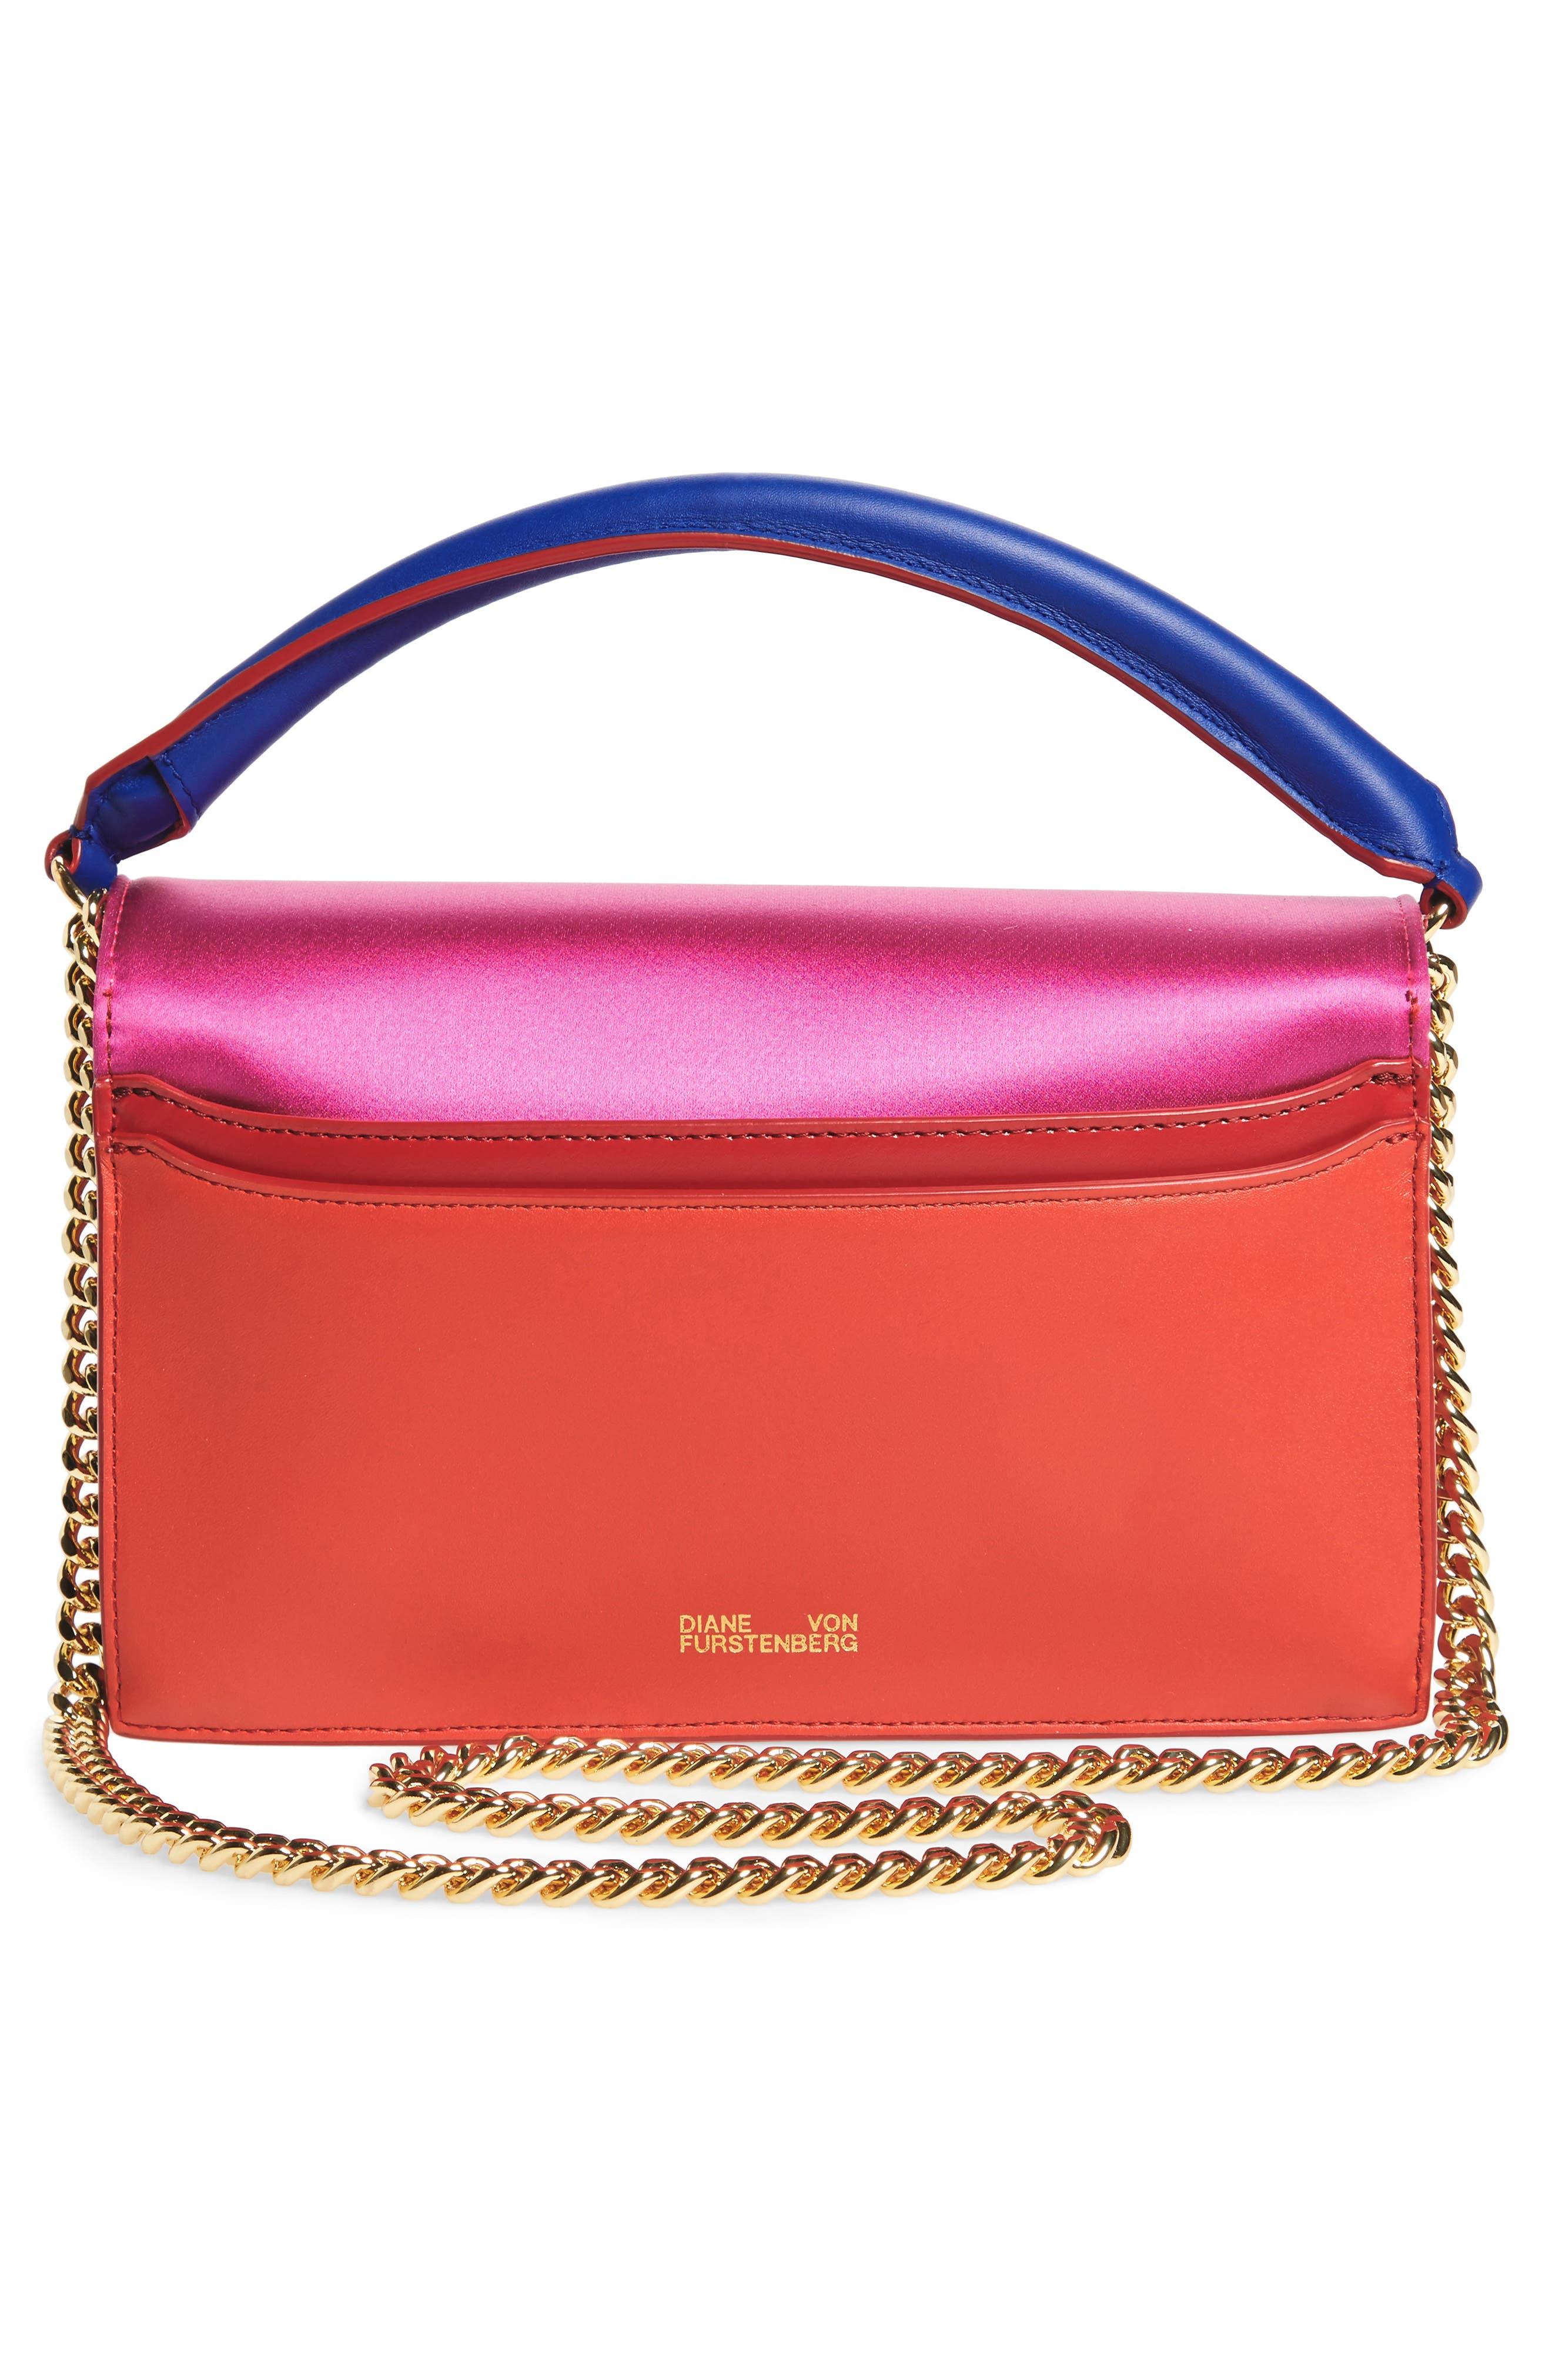 Soirée Satin & Leather Top Handle Bag,                             Main thumbnail 1, color,                             Pink